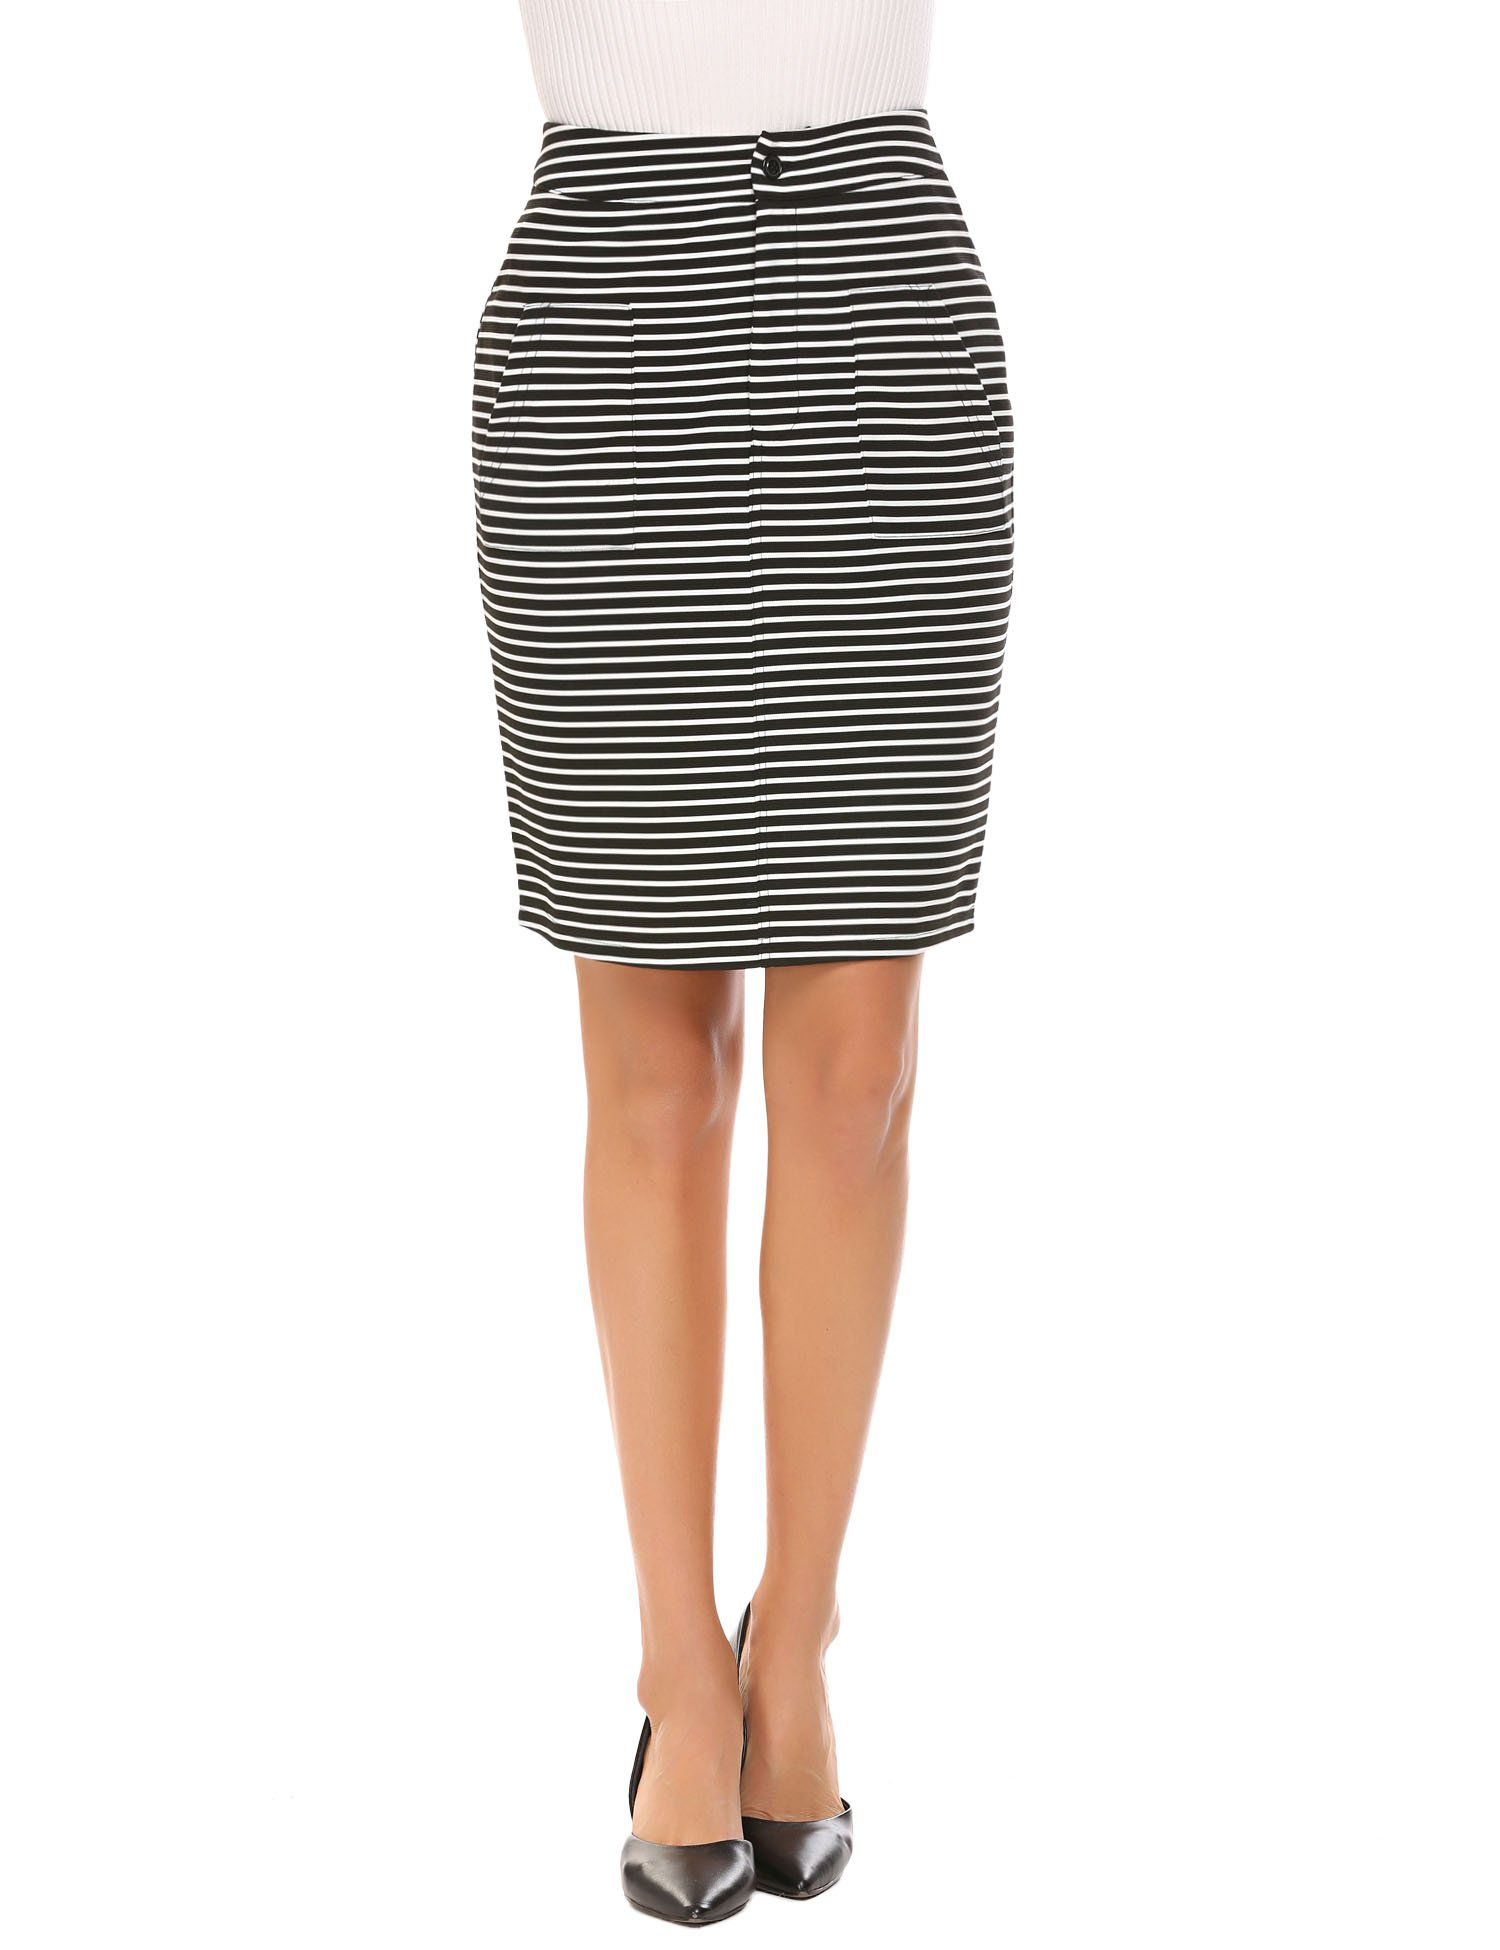 Chigant Women's High Waist Striped Stretchy Pencil Skirt,Black,Medium by Chigant